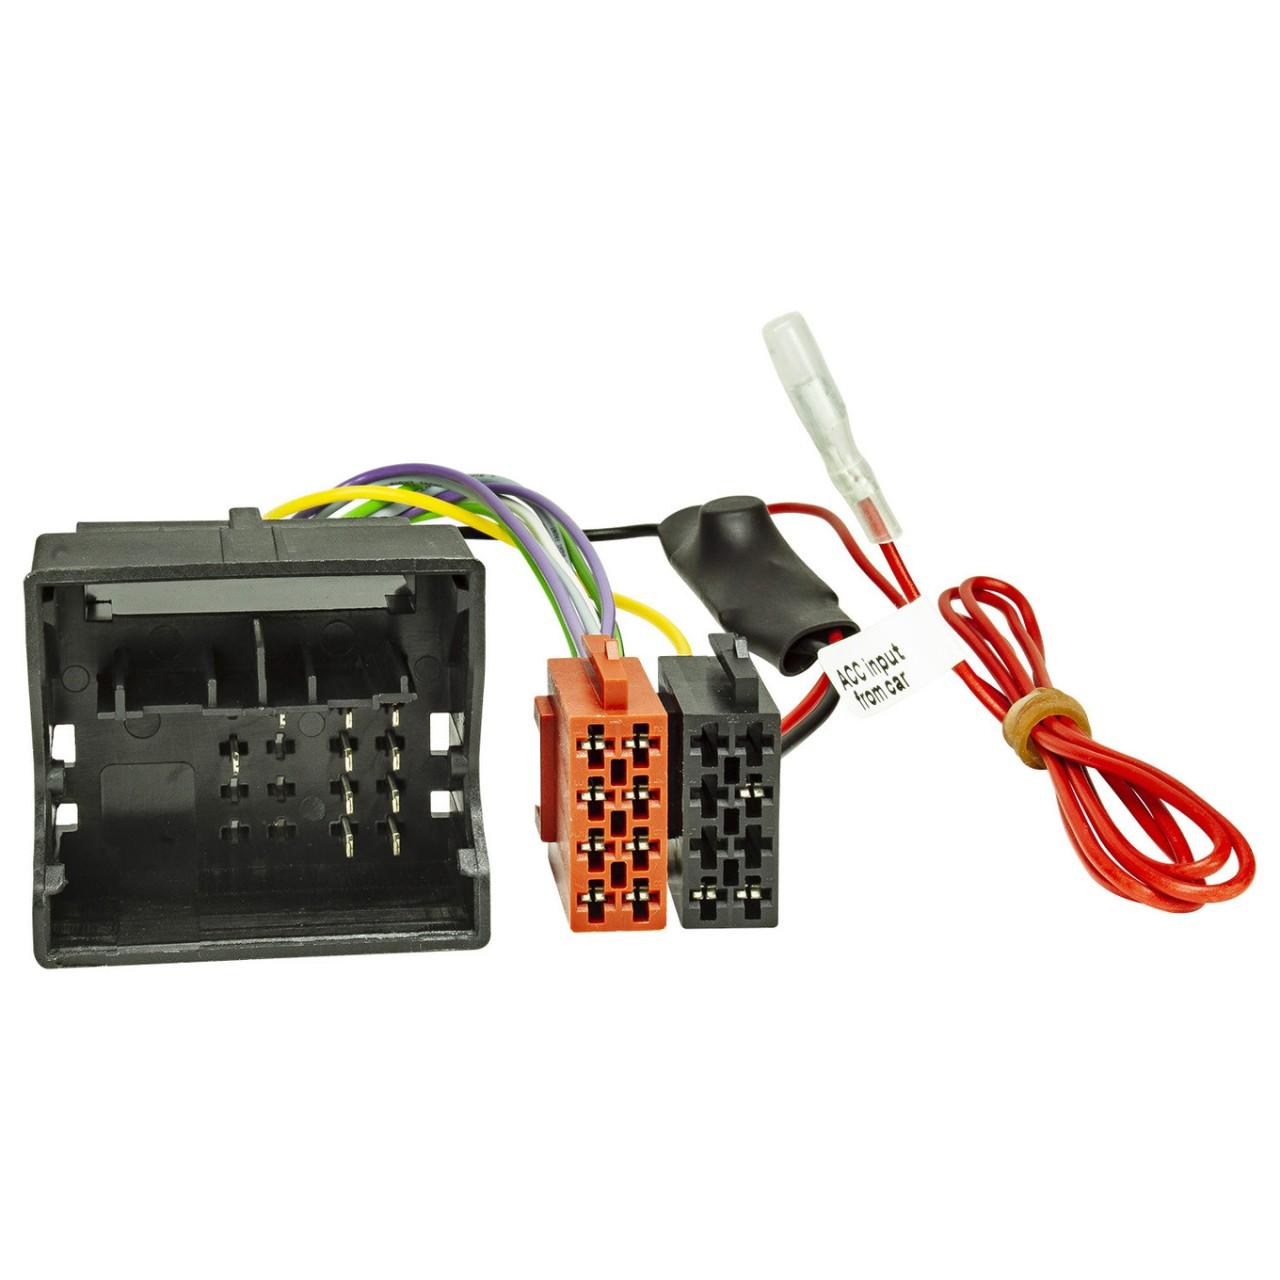 Power Stabilisator Start Stop Quadlock Stecker ISO Kupplung